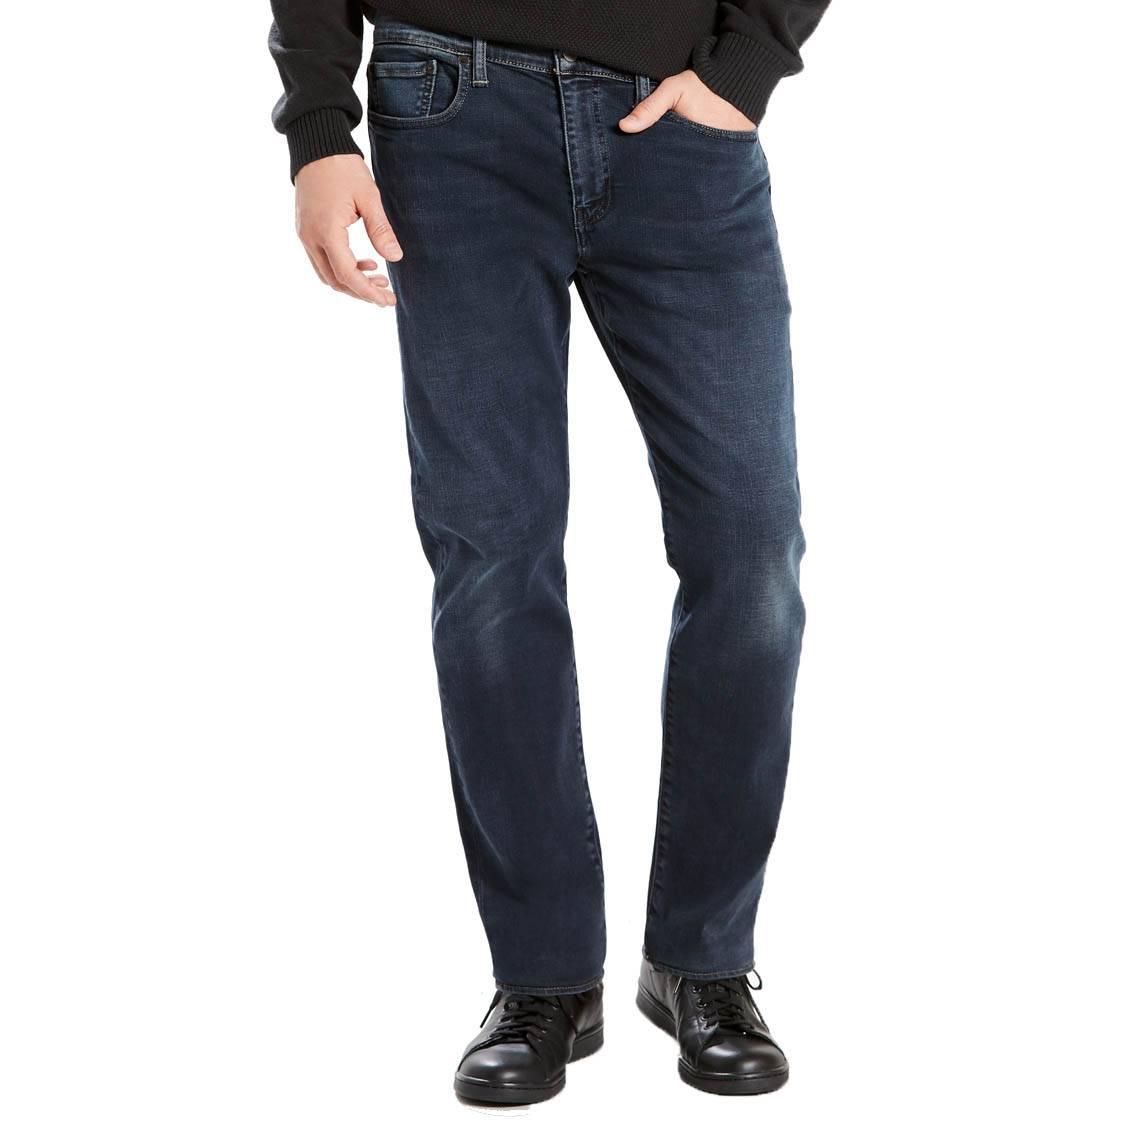 1d44411d95210 Jeans Levi s 502 regular taper Eyser Stretch en coton stretch bleu foncé ...